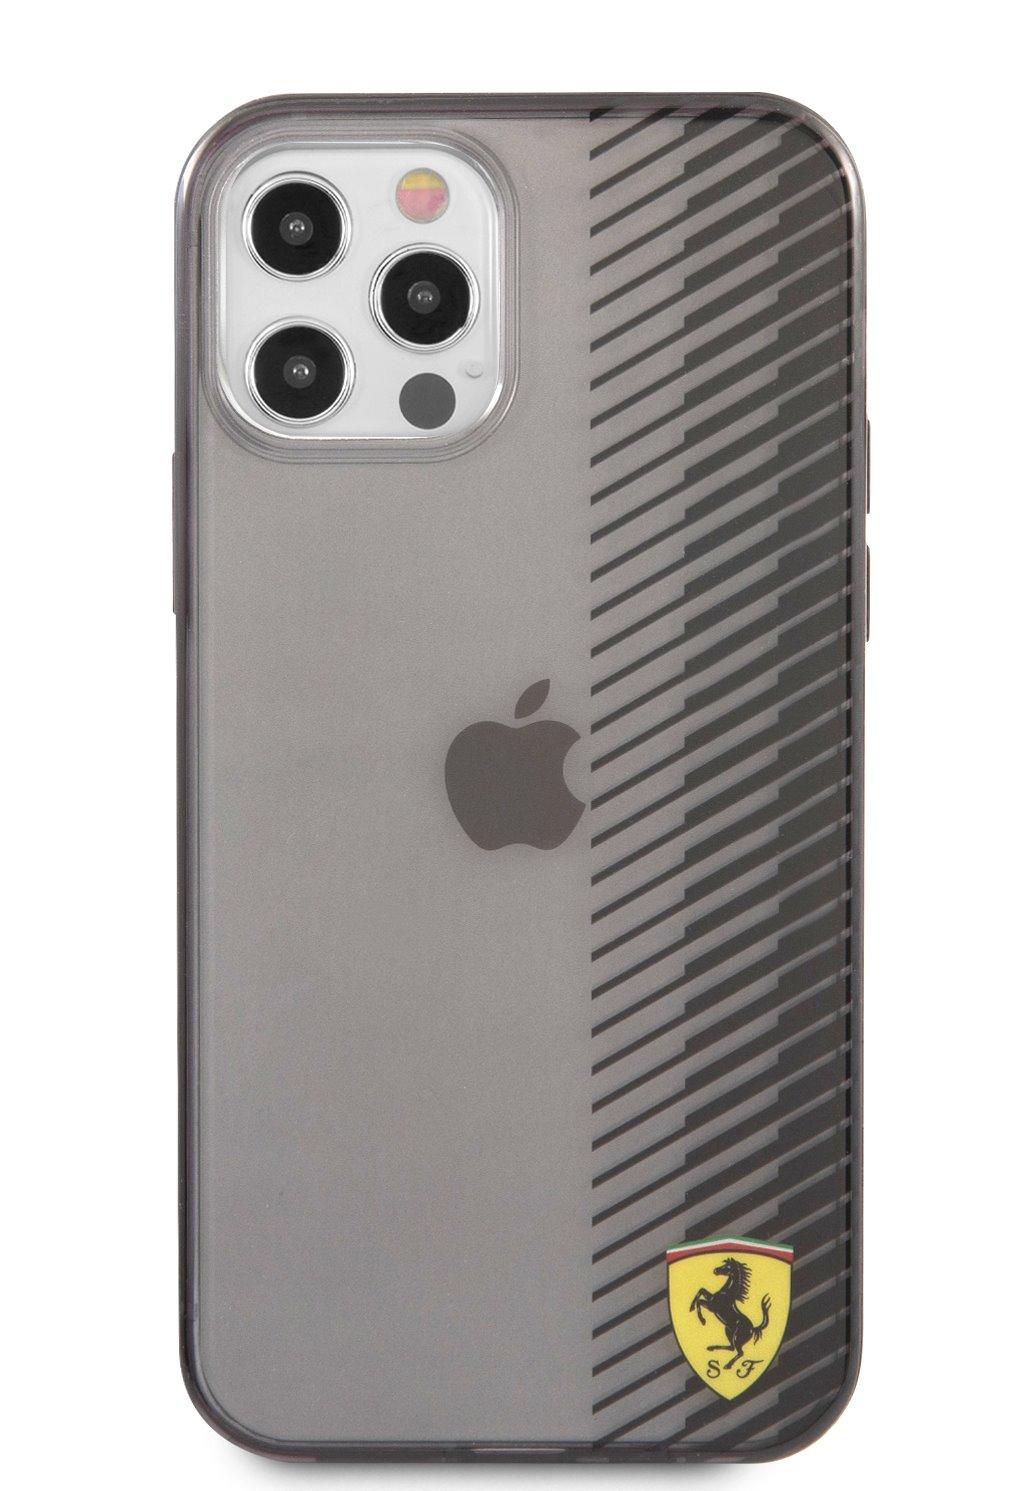 FEHCP12MUYEK Ferrari On Track Gradient Kryt pro iPhone 12/12 Pro 6.1 Black 3666339017033